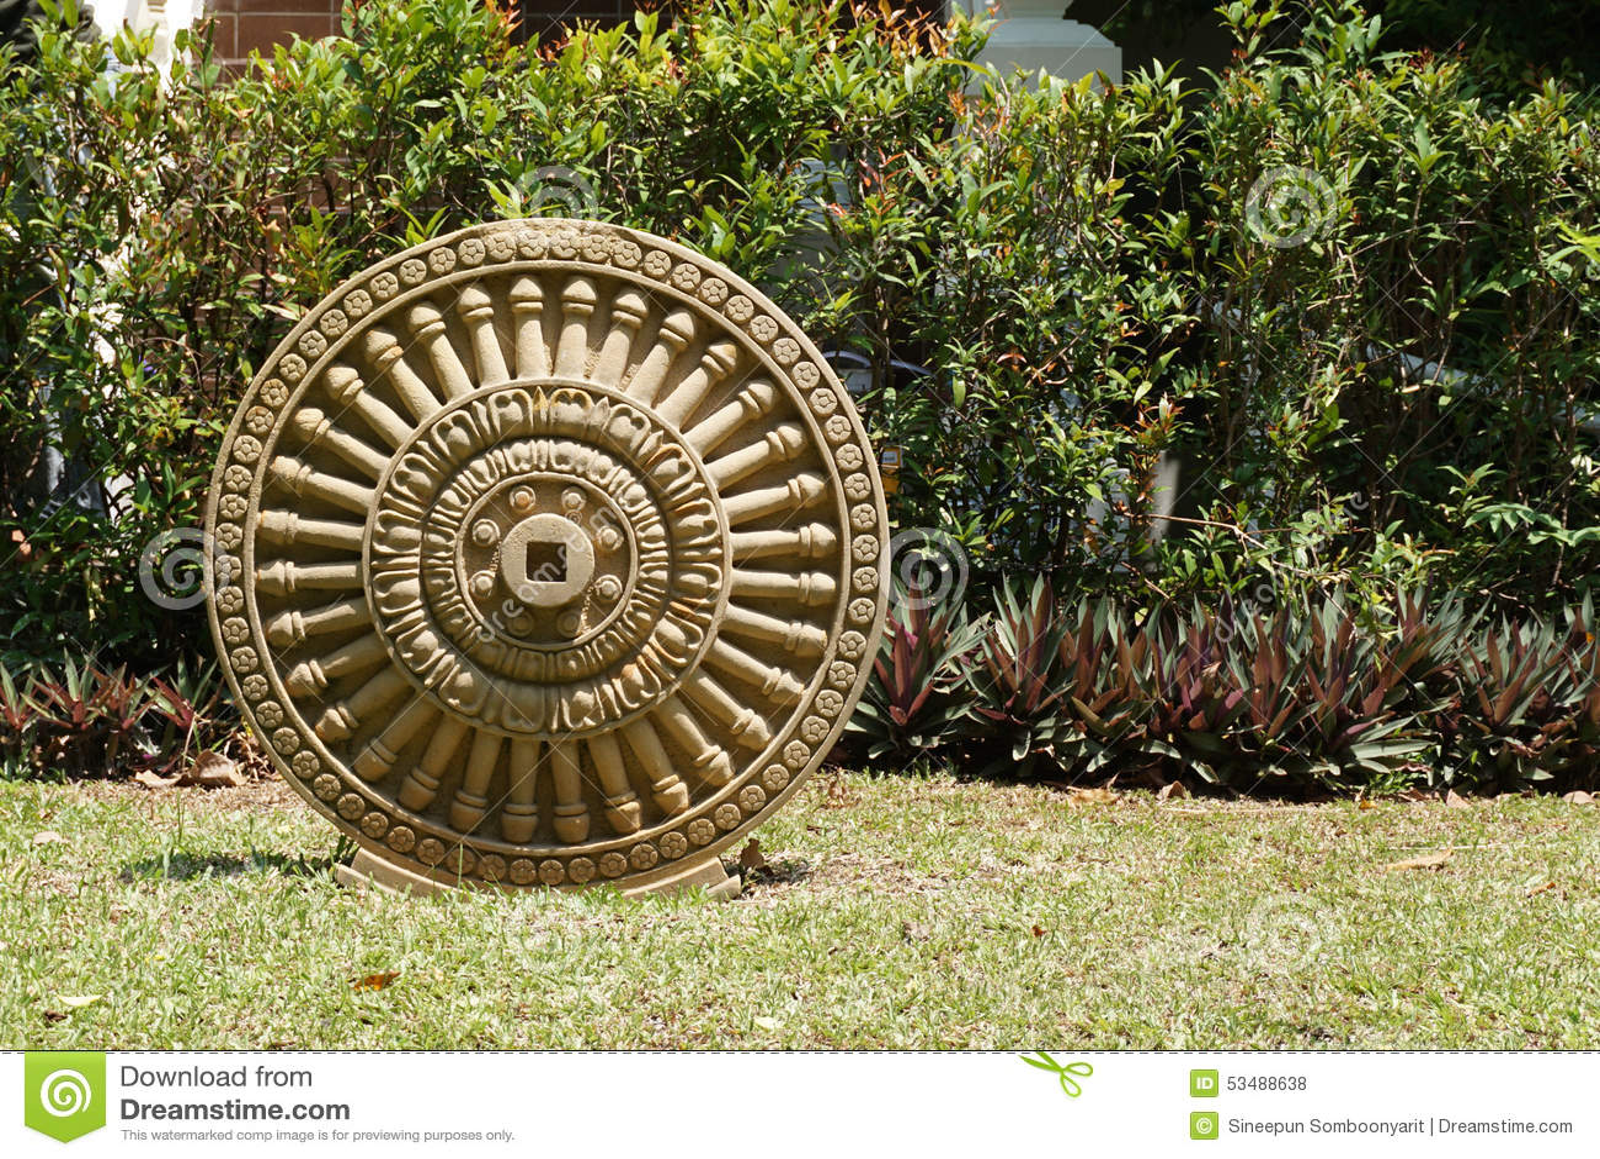 sandstone craving dhamma wheel stock photo image of icon plant